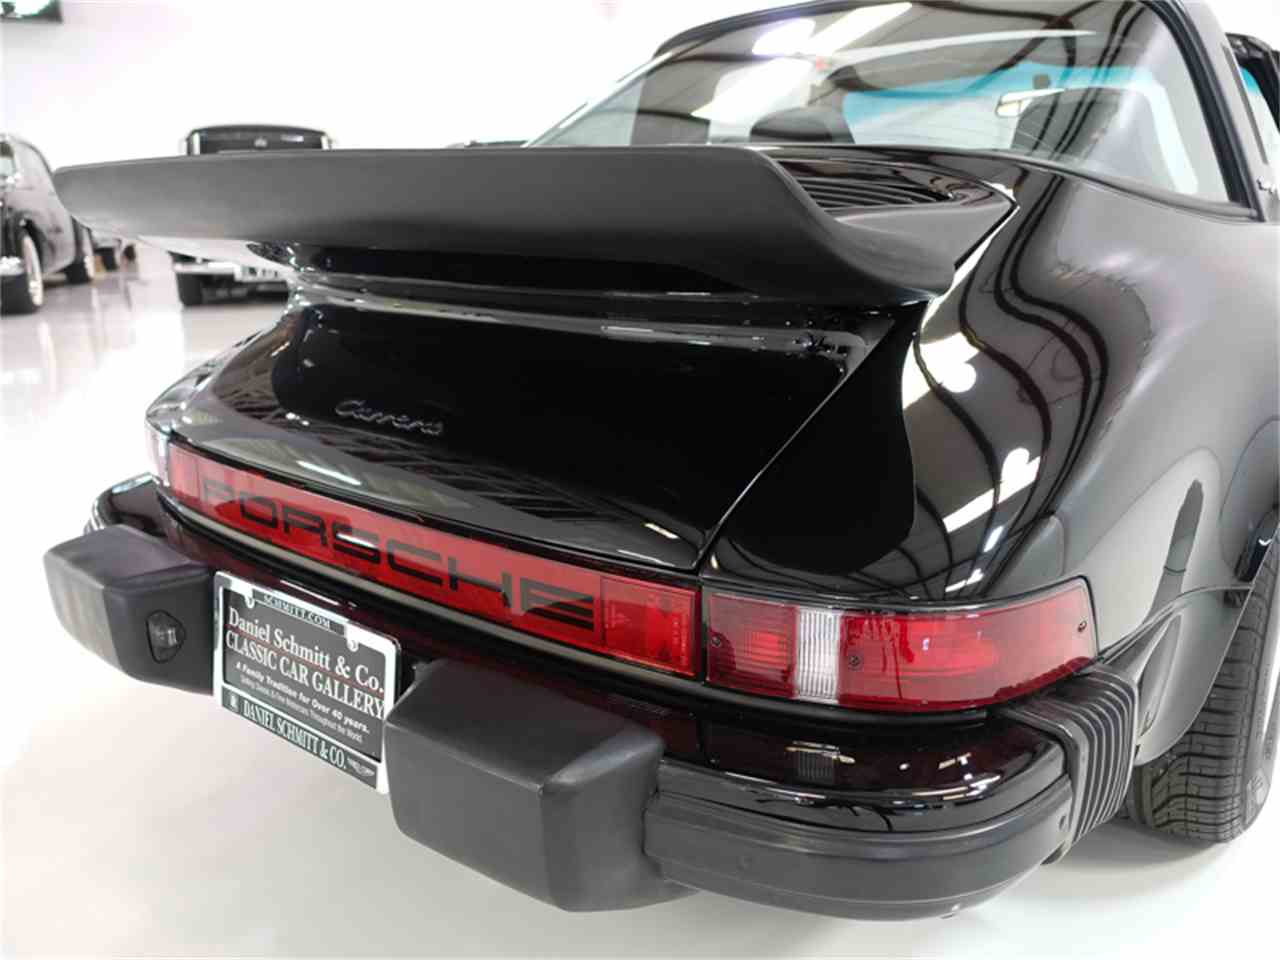 Large Picture of '75 Porsche 911 Carrera located in Missouri Offered by Daniel Schmitt & Co. - KKFN